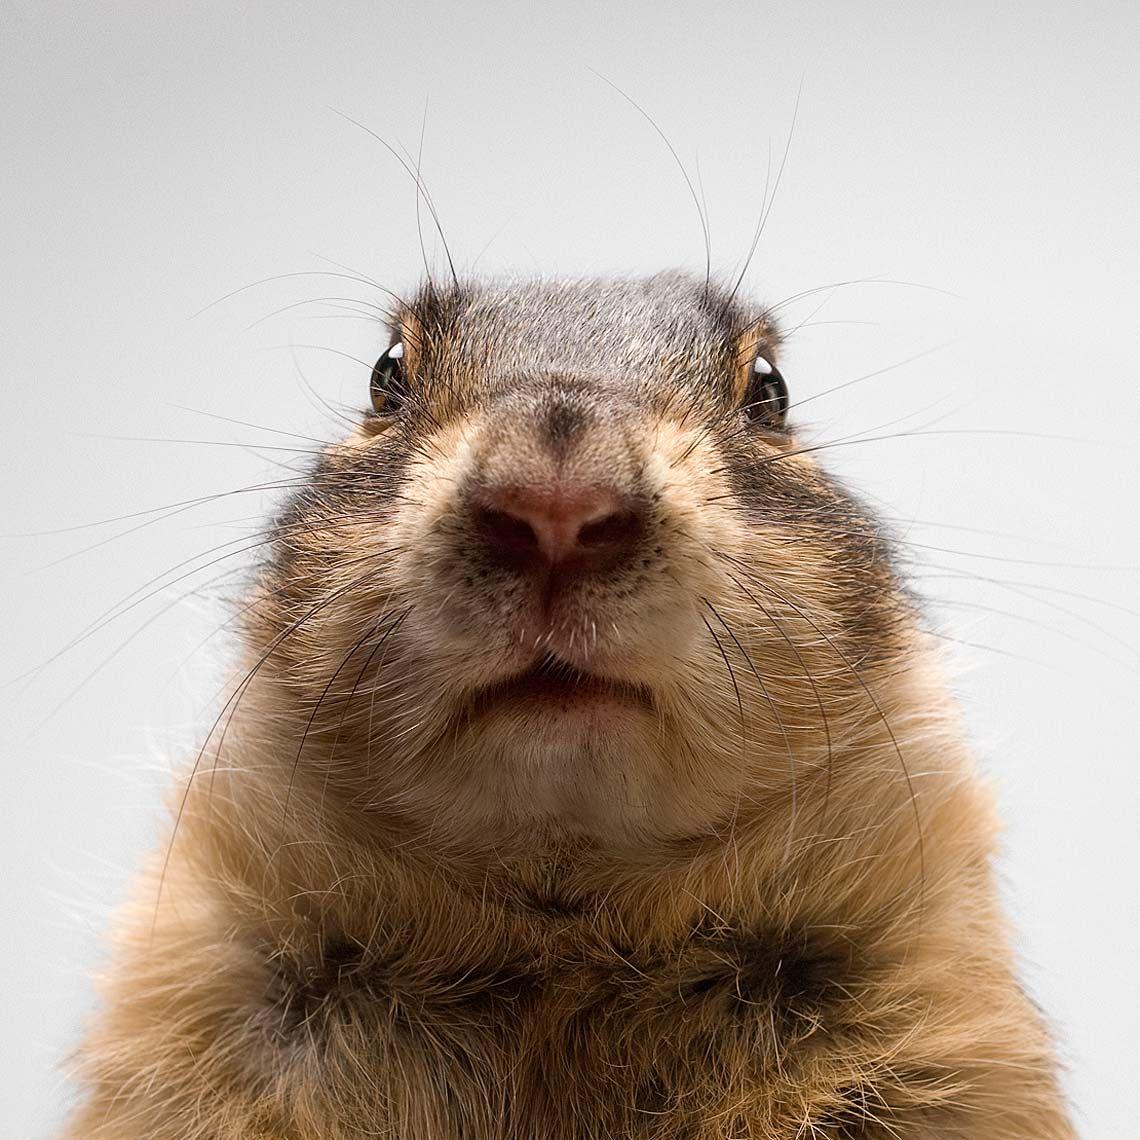 Marmota.